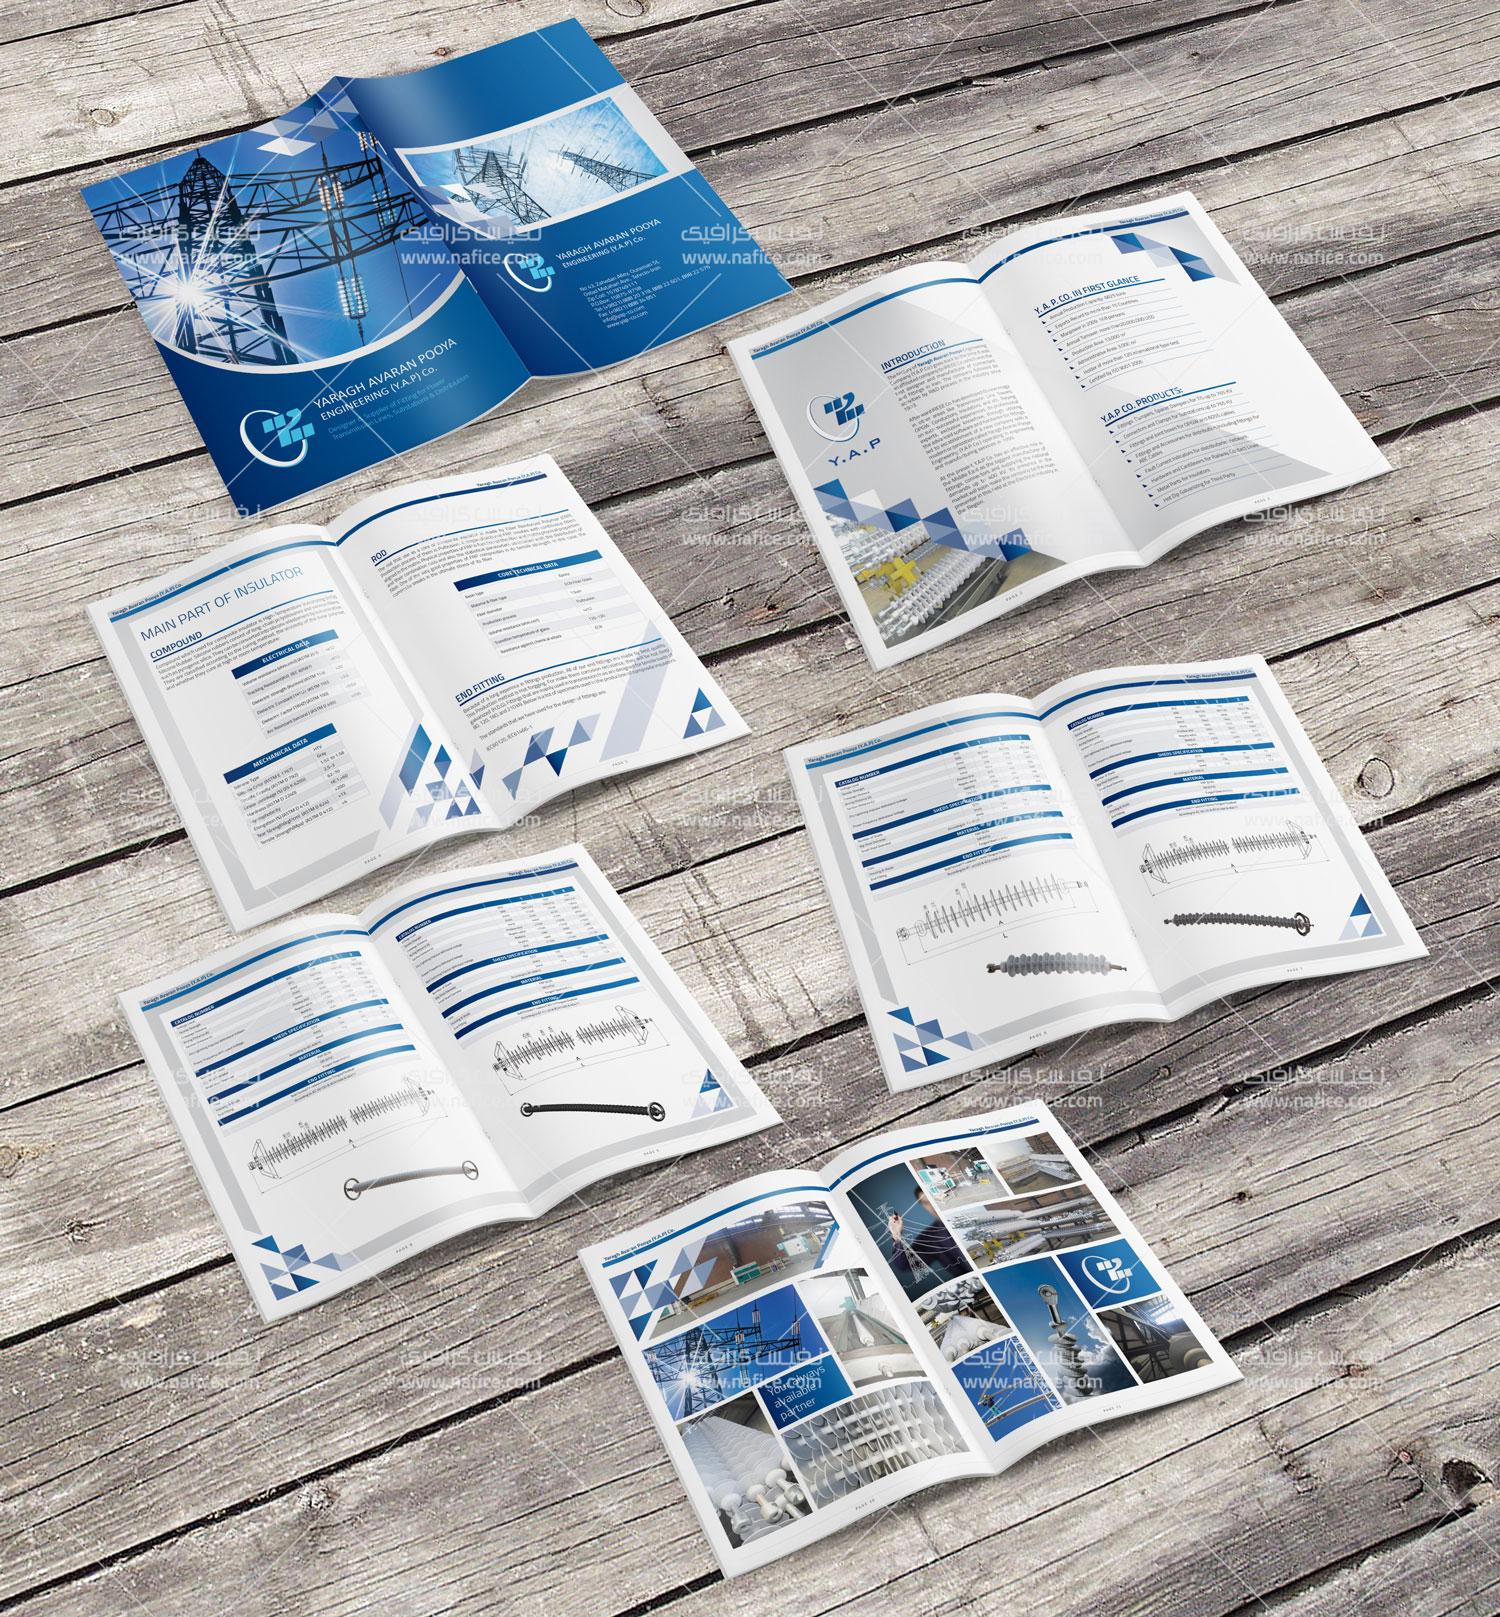 چاپ و طراحی کاتالوگ شرکت مهندسی یراق آوران پویا -  -